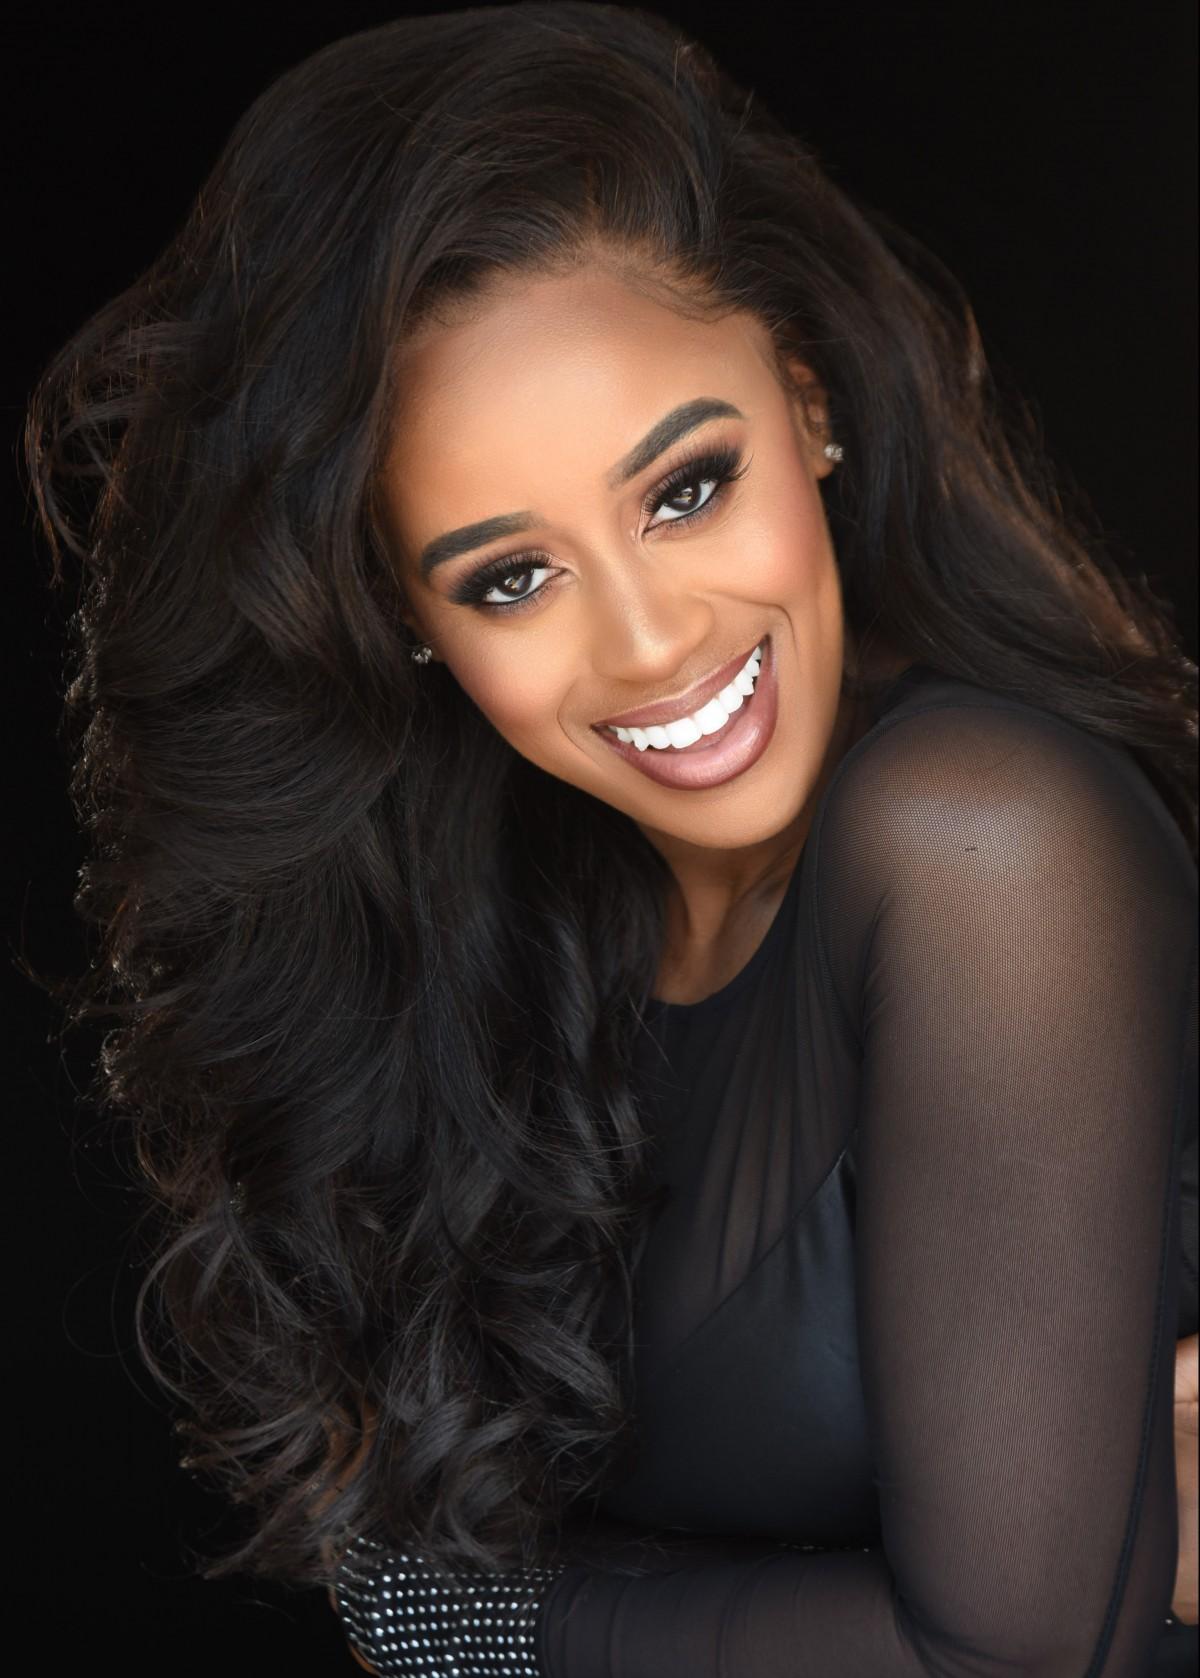 Shelby Dixon